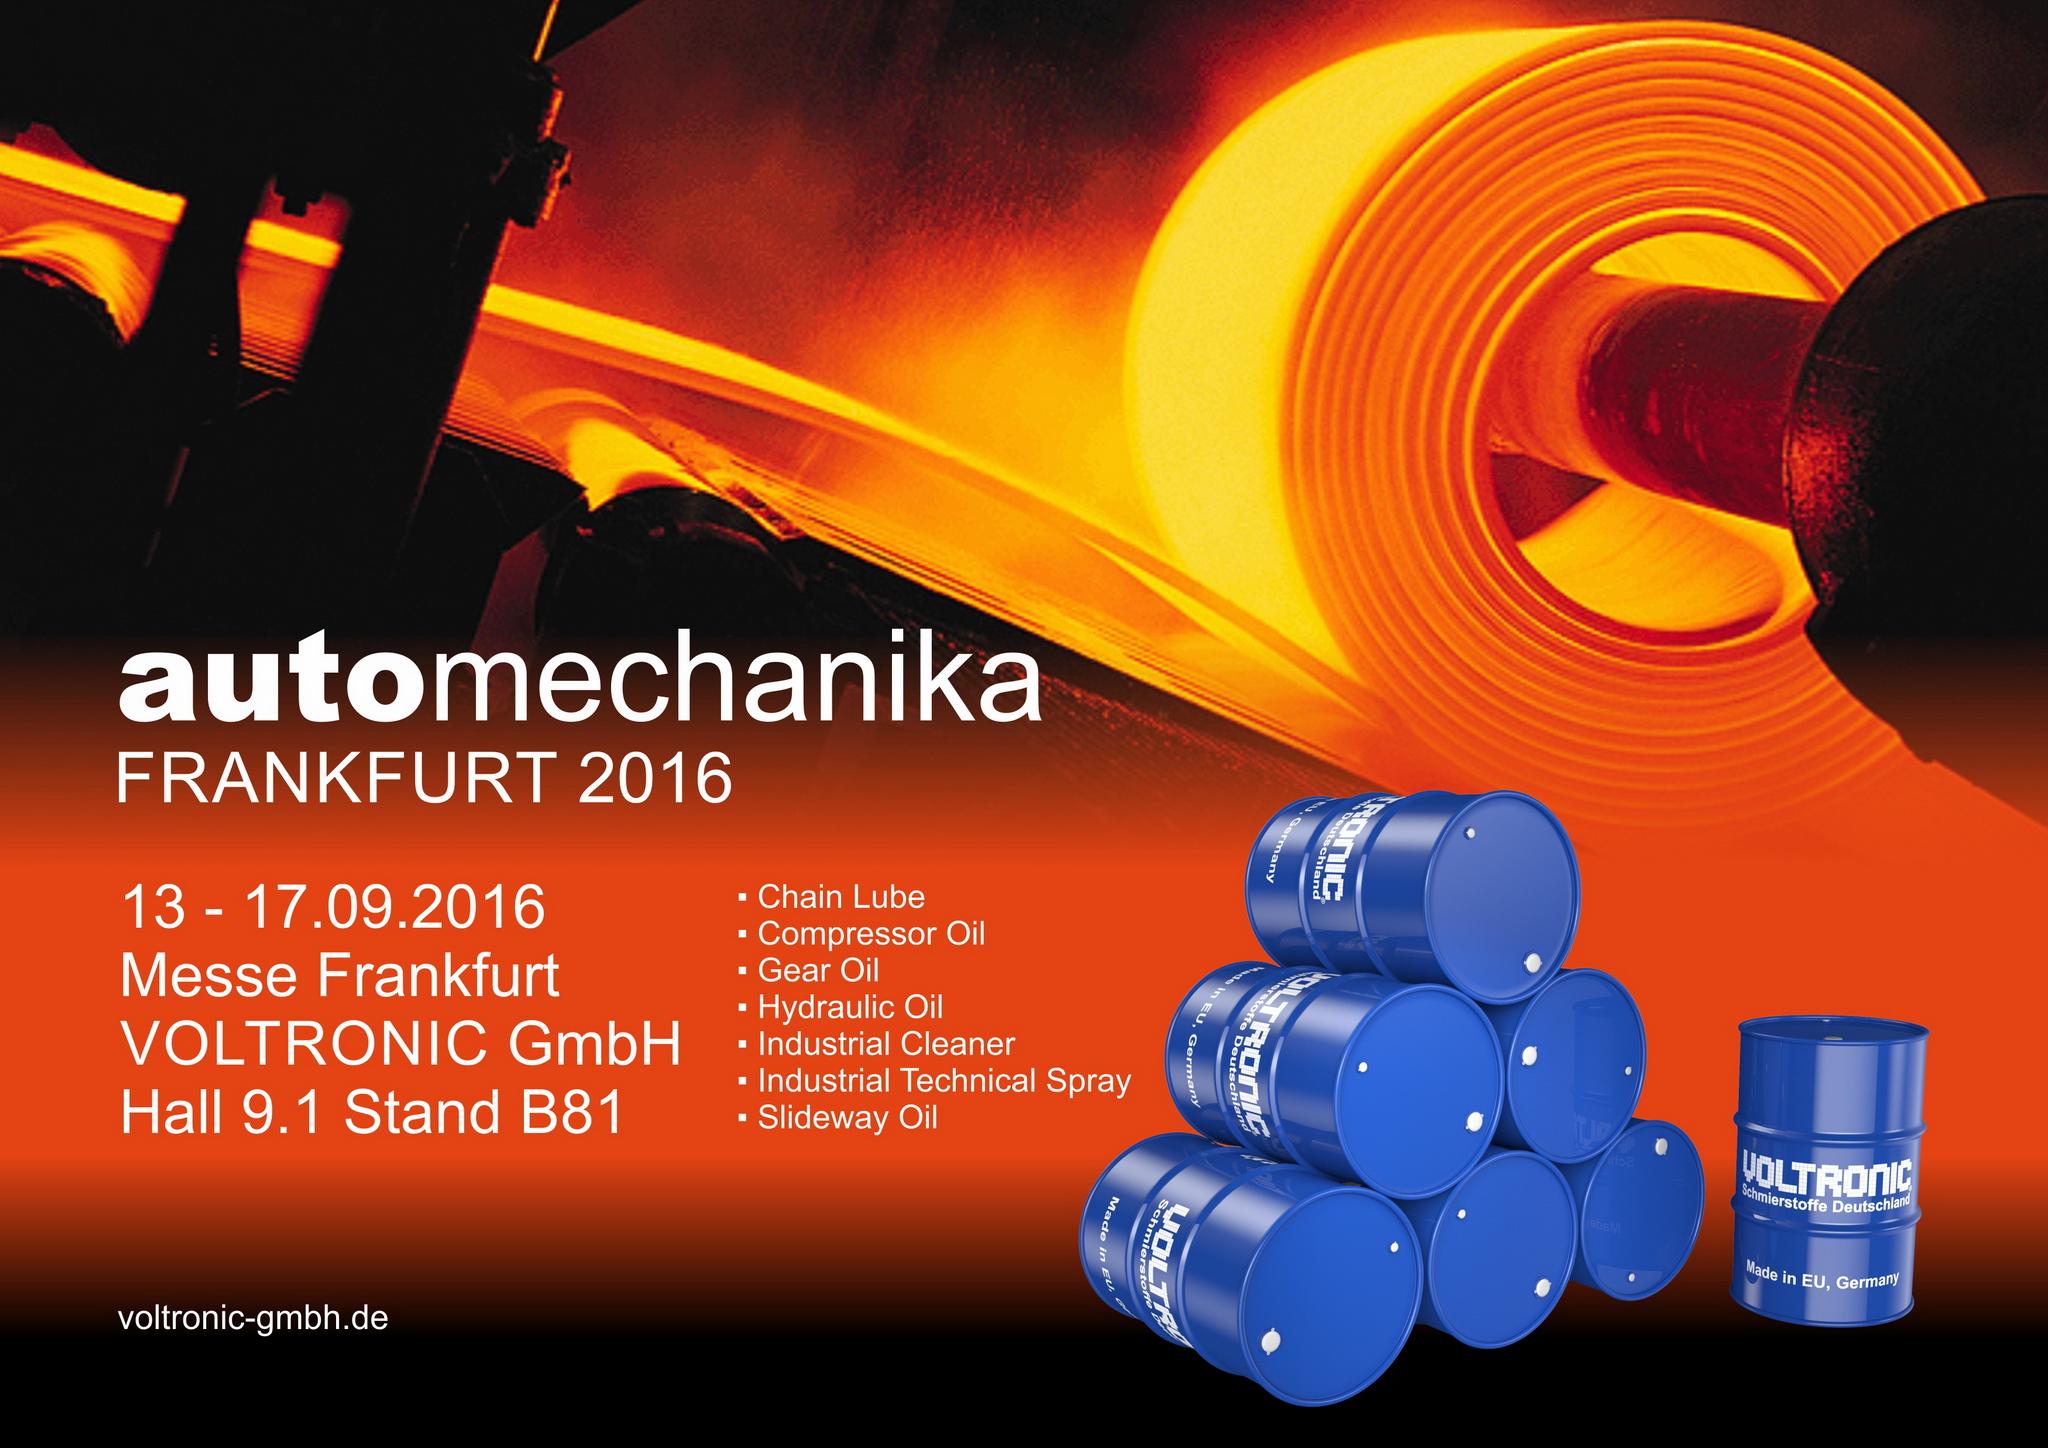 2016 Automechanika Frankfurt Welcome To Voltronic